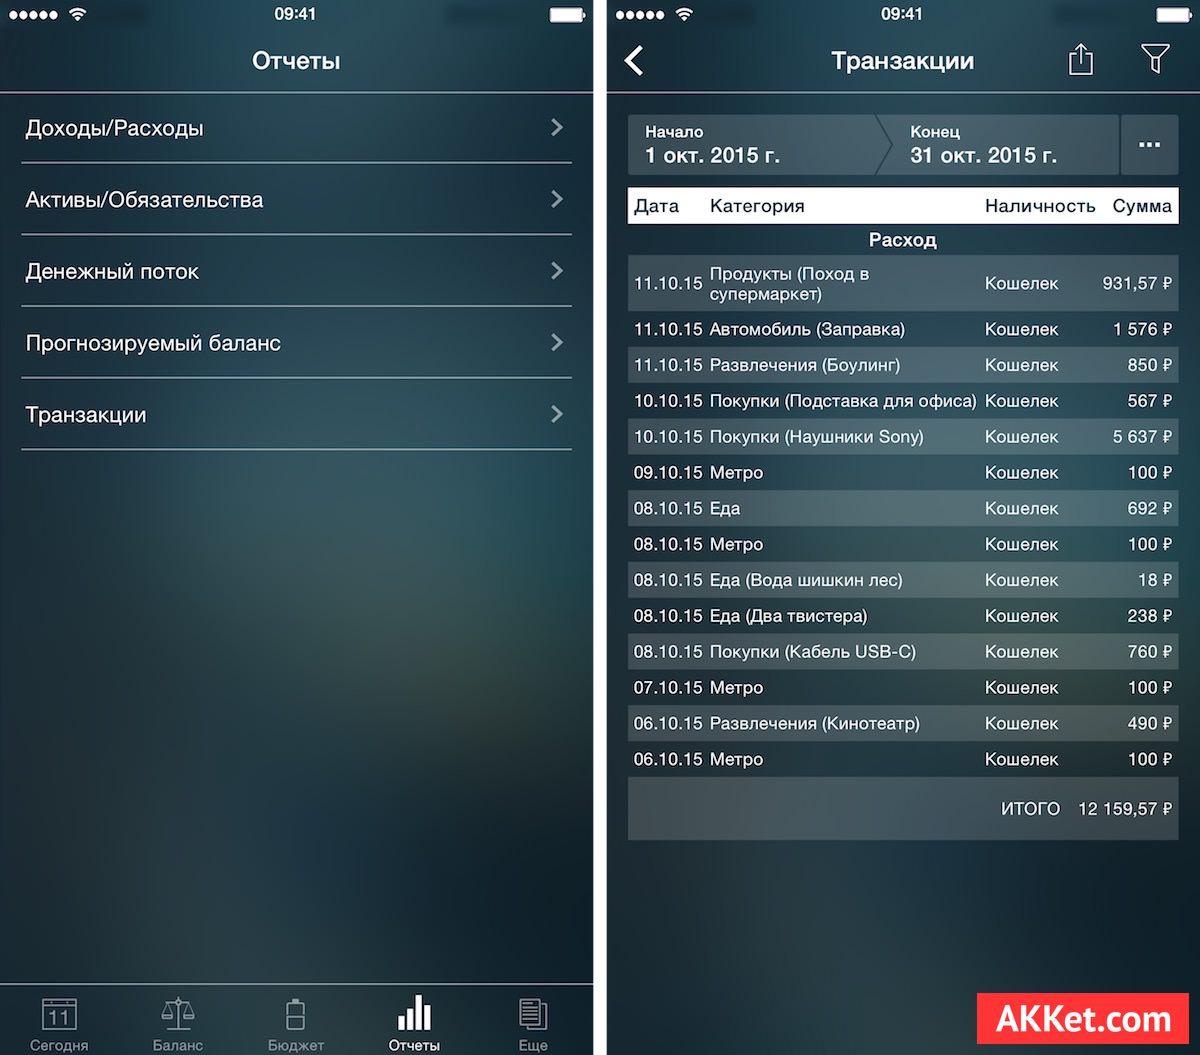 Money Pro akket.com review iOS os x mac iPhone iPad macbook imac pro iPhone 6s plus app store 5